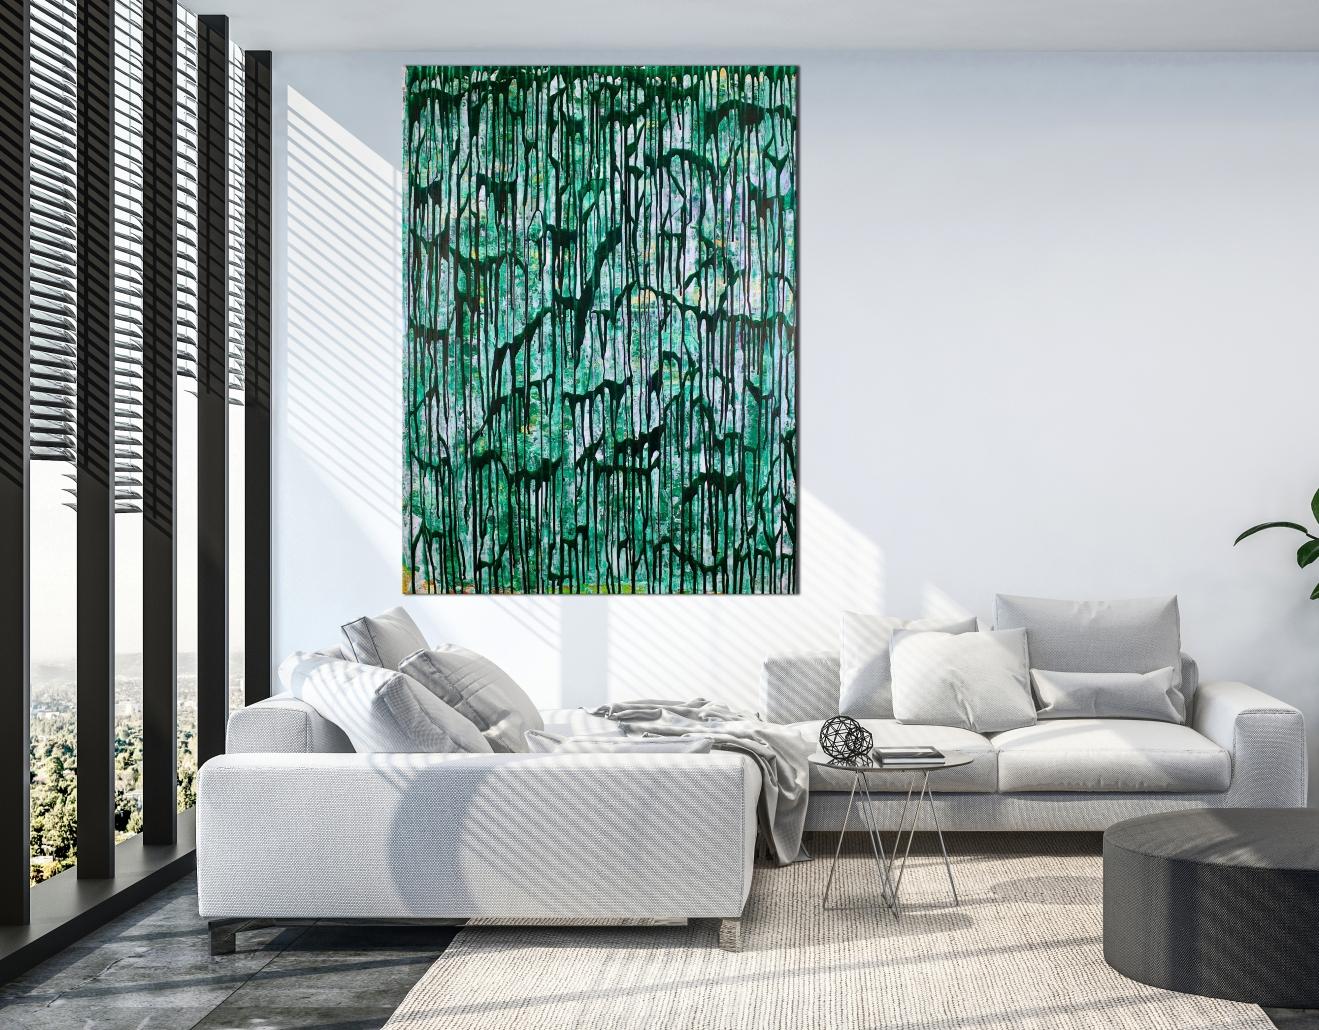 Room View - Green Gravity by Nestor Toro in Los Angeles